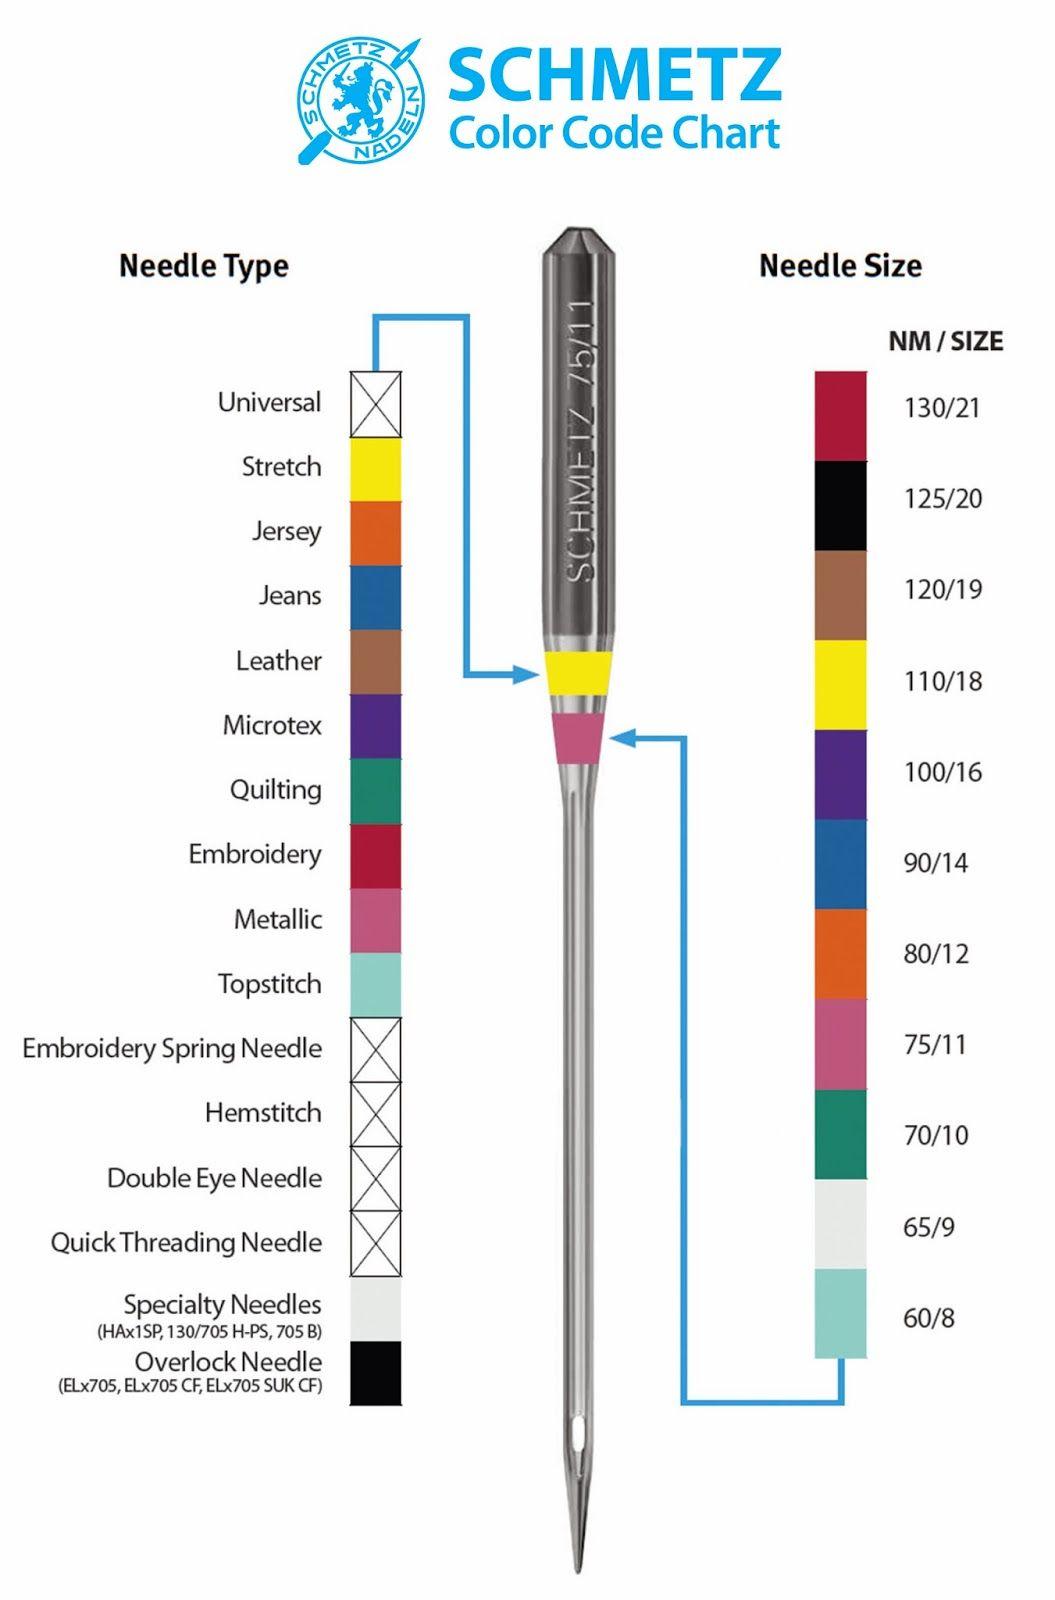 SEWING MACHINE NEEDLES SCHMETZ size 120//19 VERY HEAVY DUTY STRONG NEEDLE